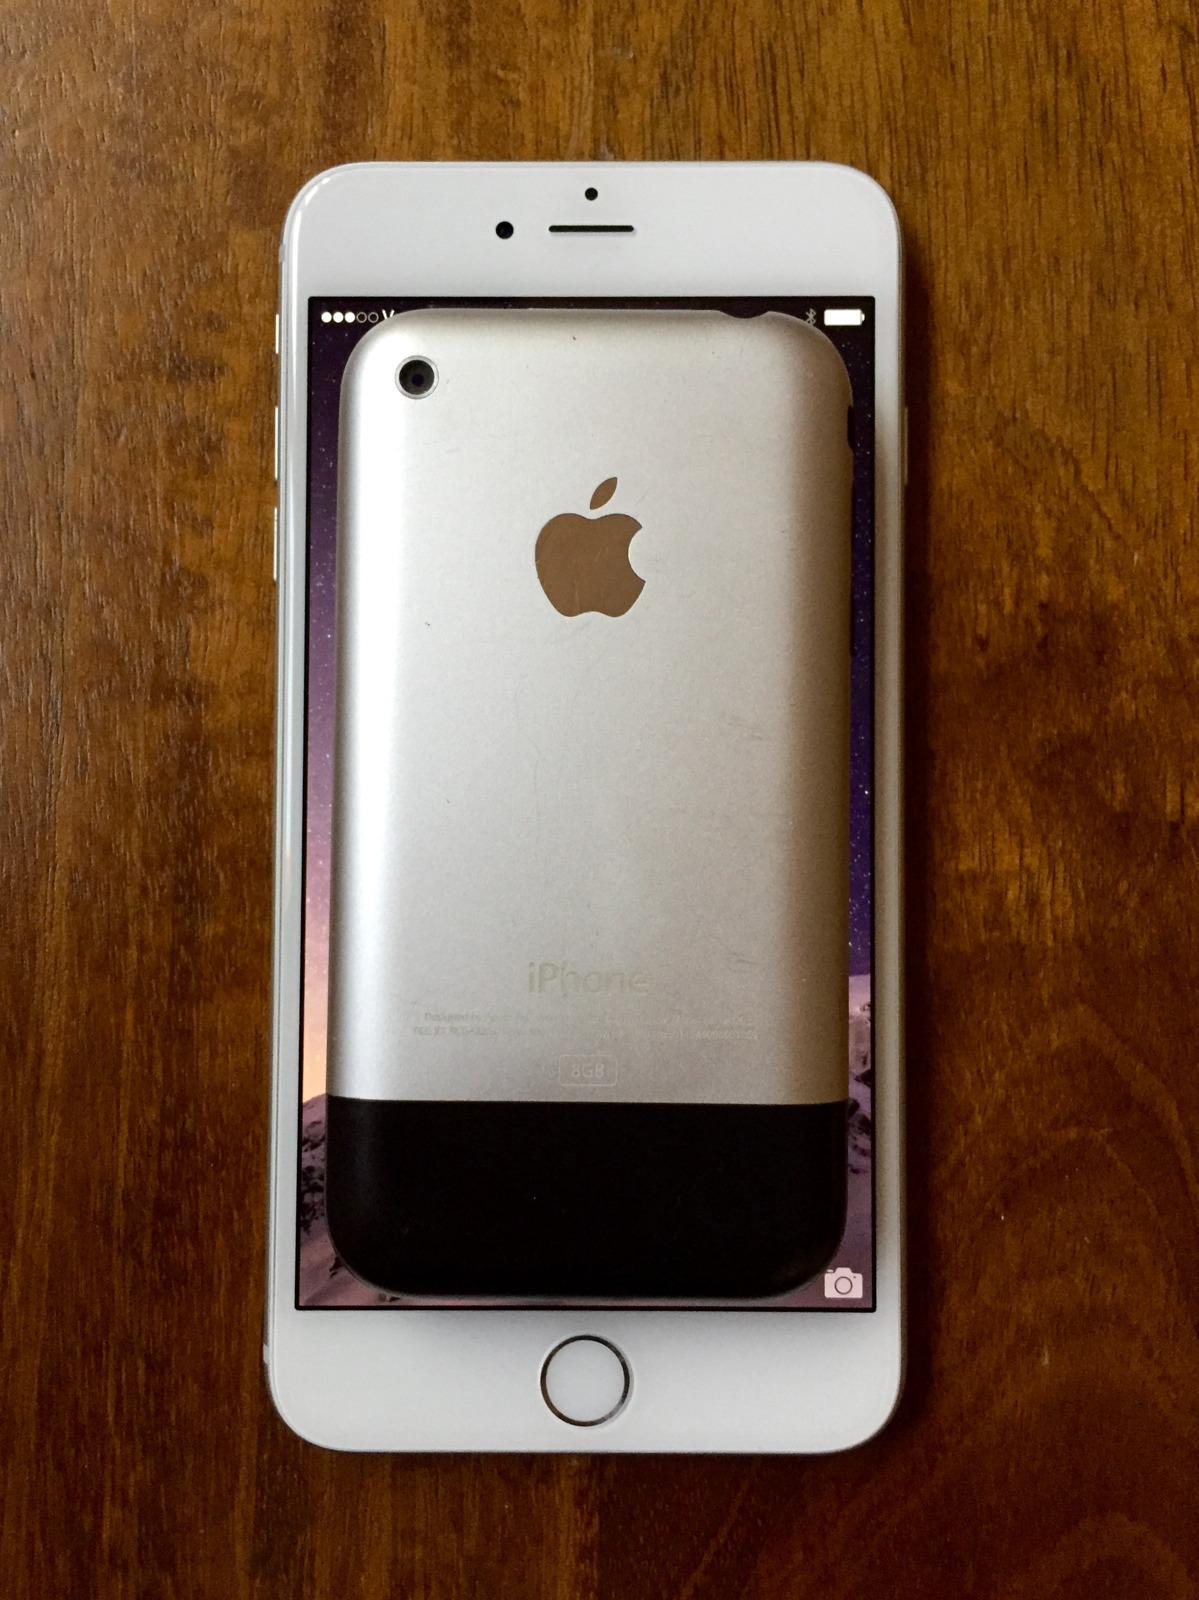 The iPhones 6